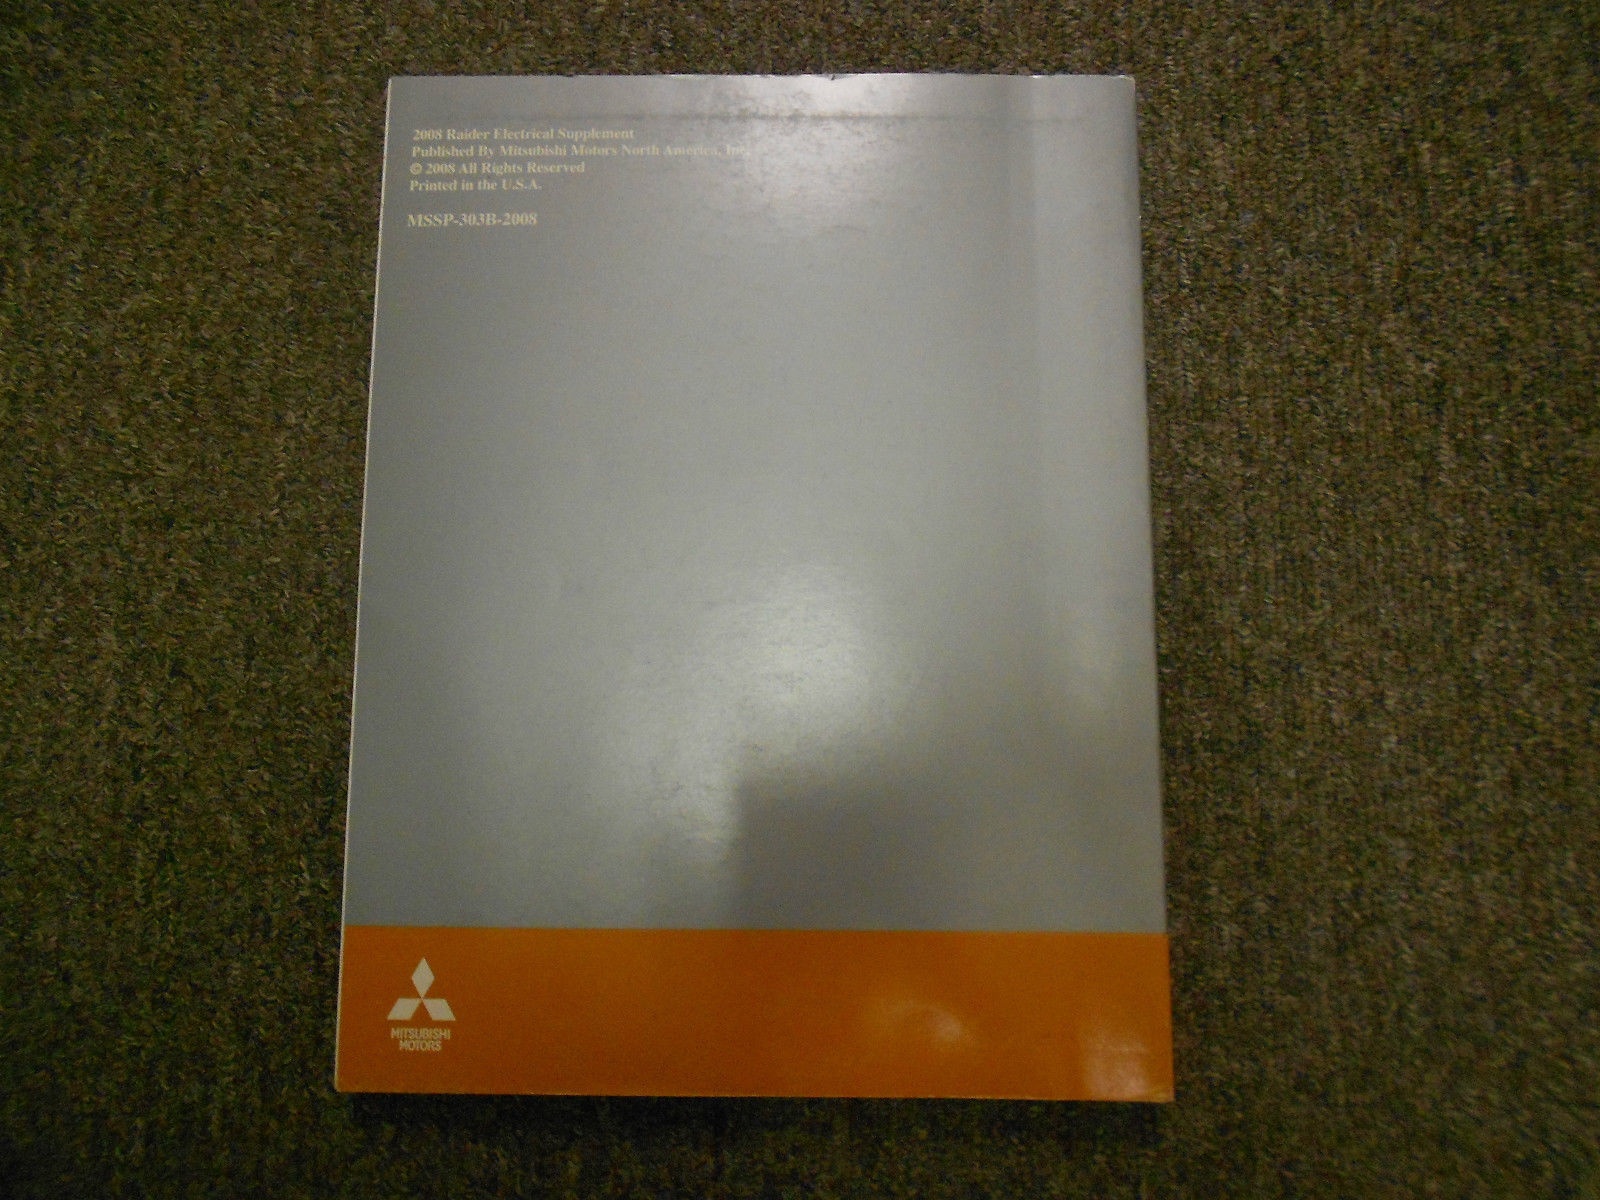 2008 MITSUBISHI Raider Electrical Supplement Service Repair Shop Manual OEM EWD